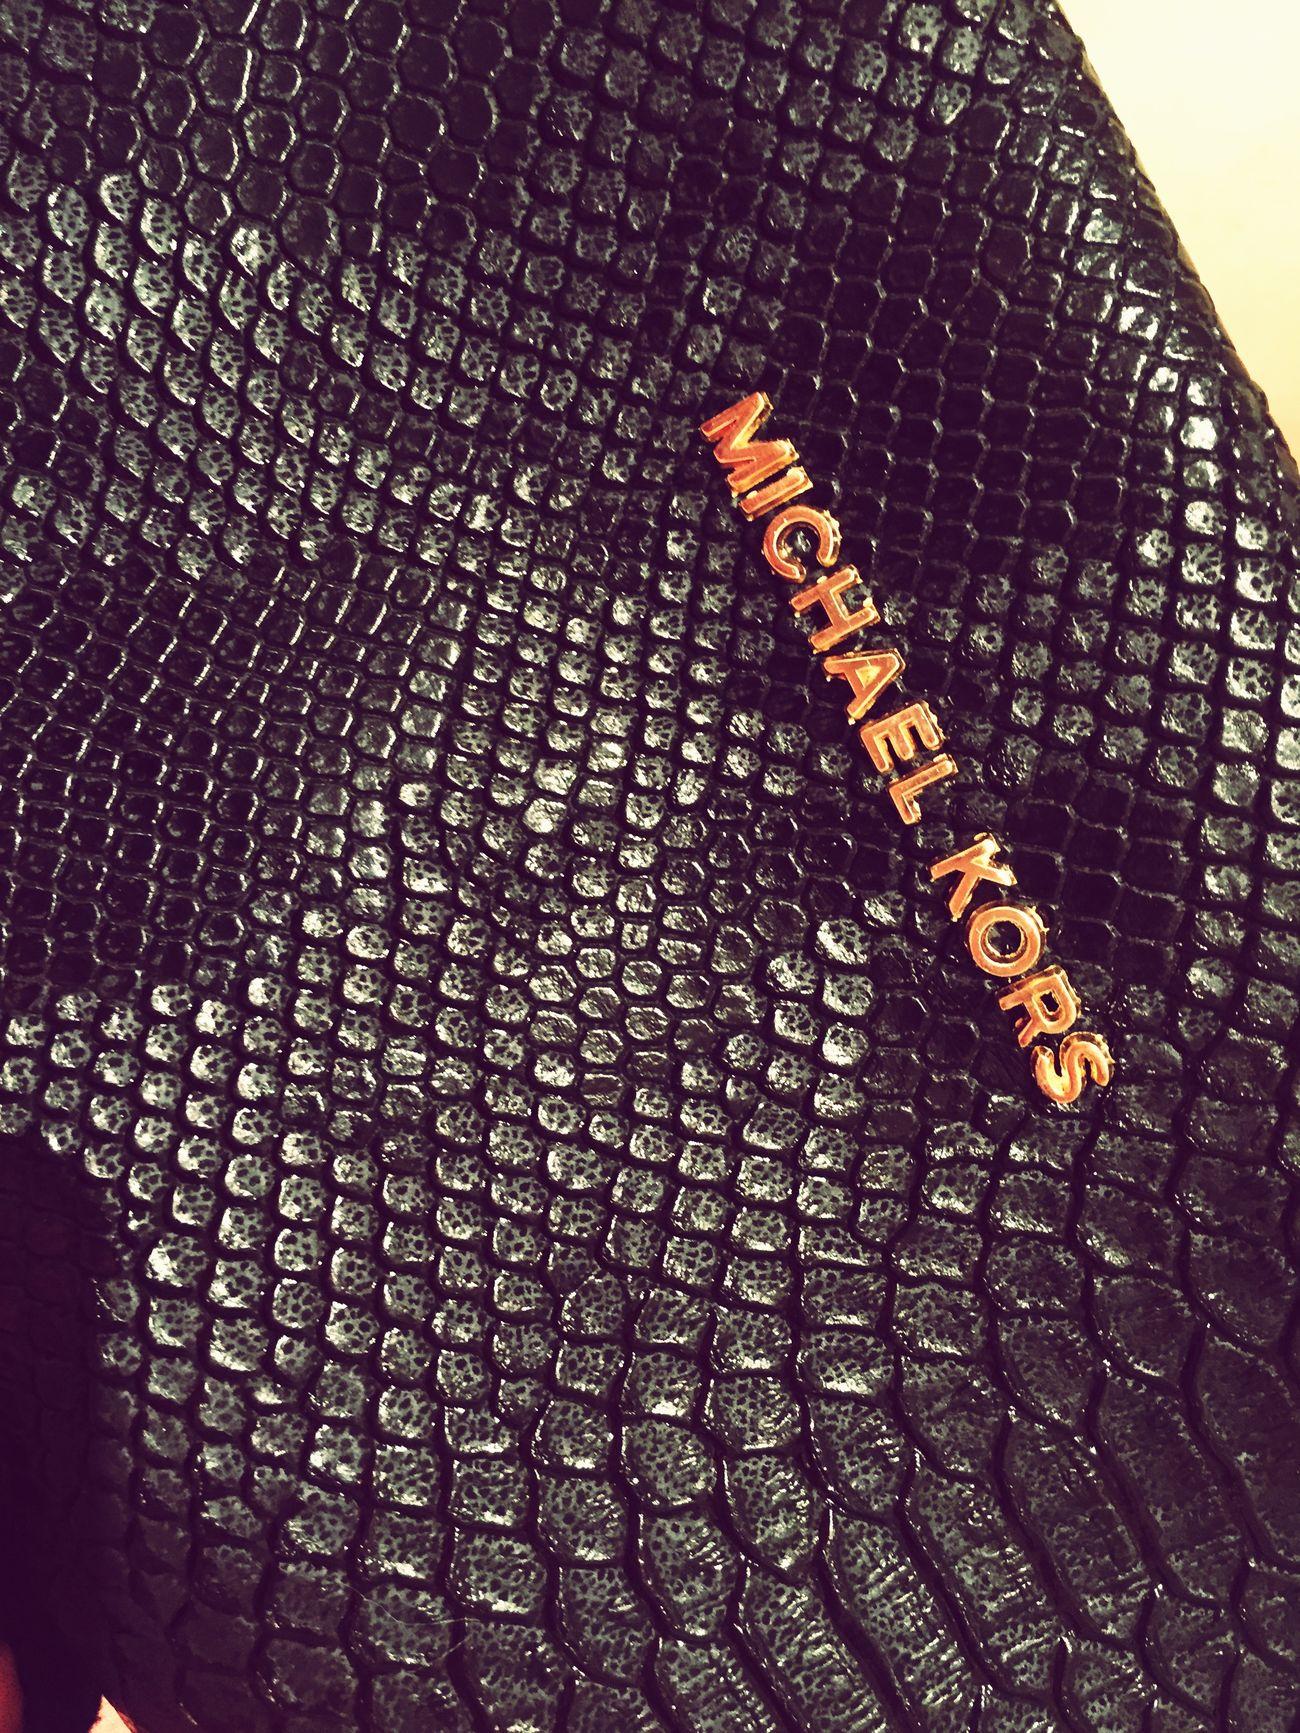 Michaelkors Purse Bag Design Michaelkors Bag Love Happy Girly